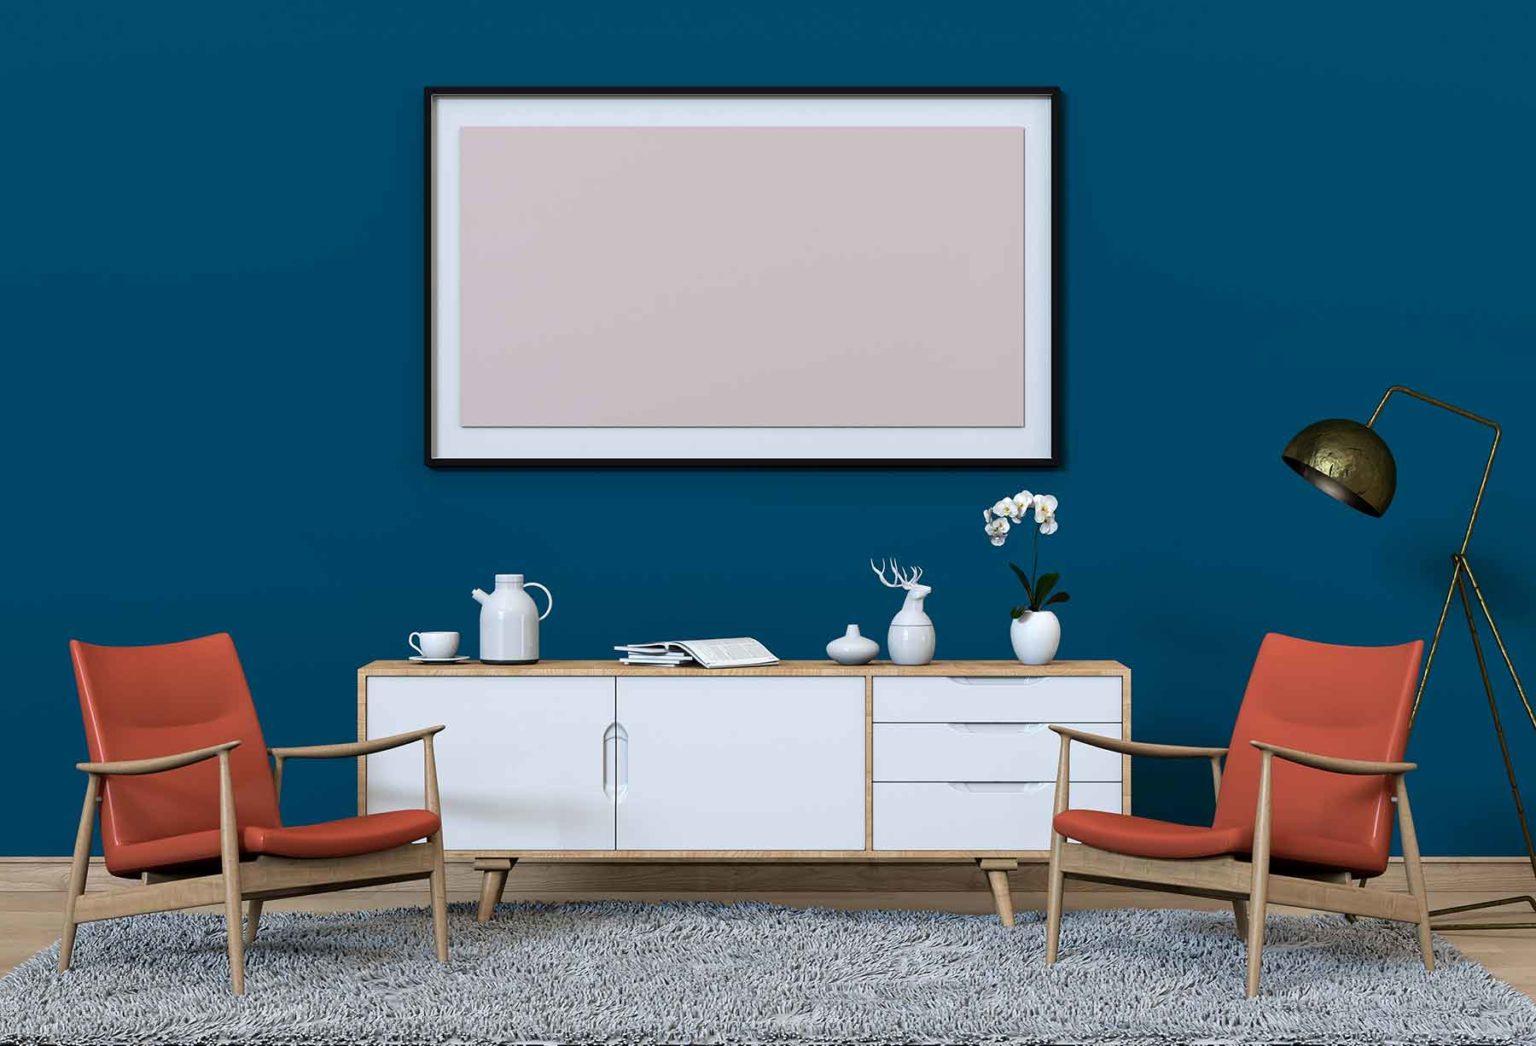 3d-rendering-of-living-room-interior-with-armchair-J92KVAK.jpg